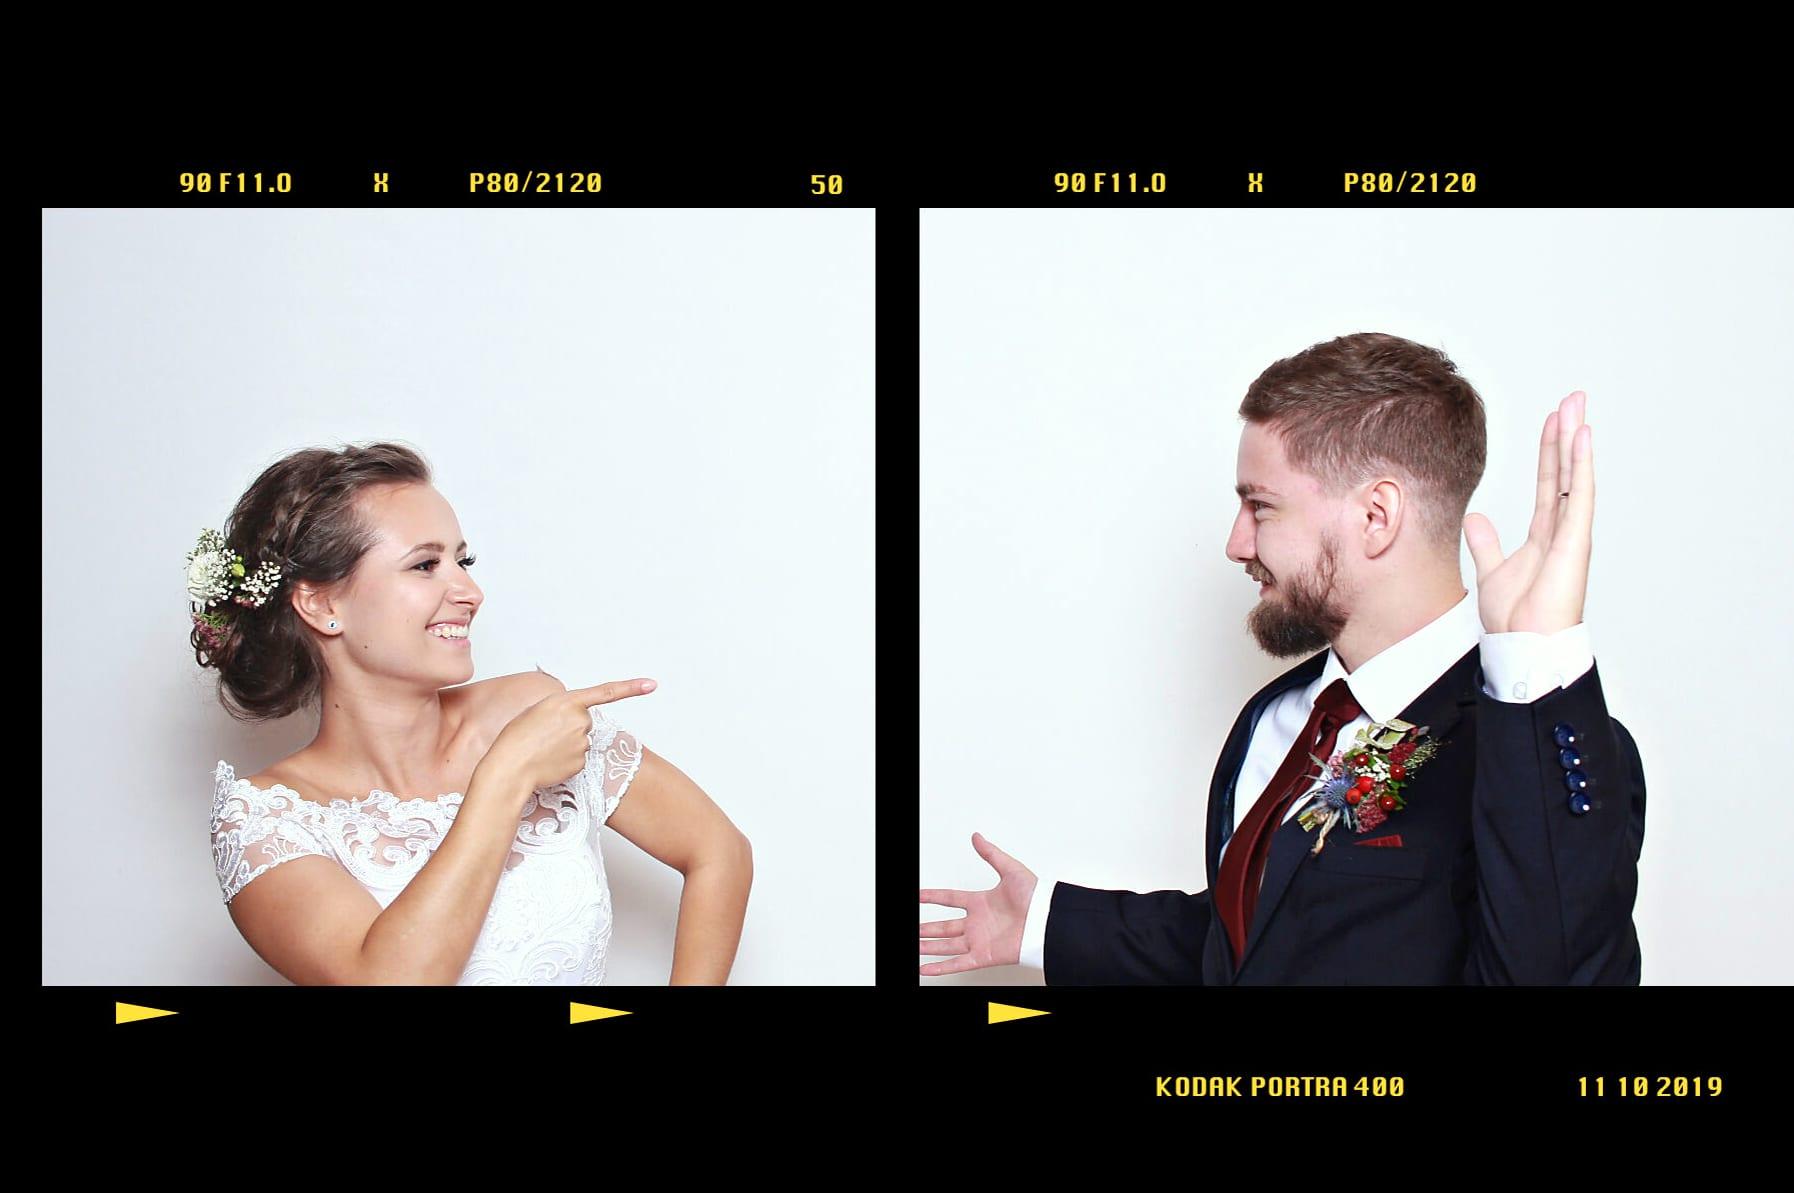 fotokoutek-ostrava-svatba-kr-11-10-2019-661369